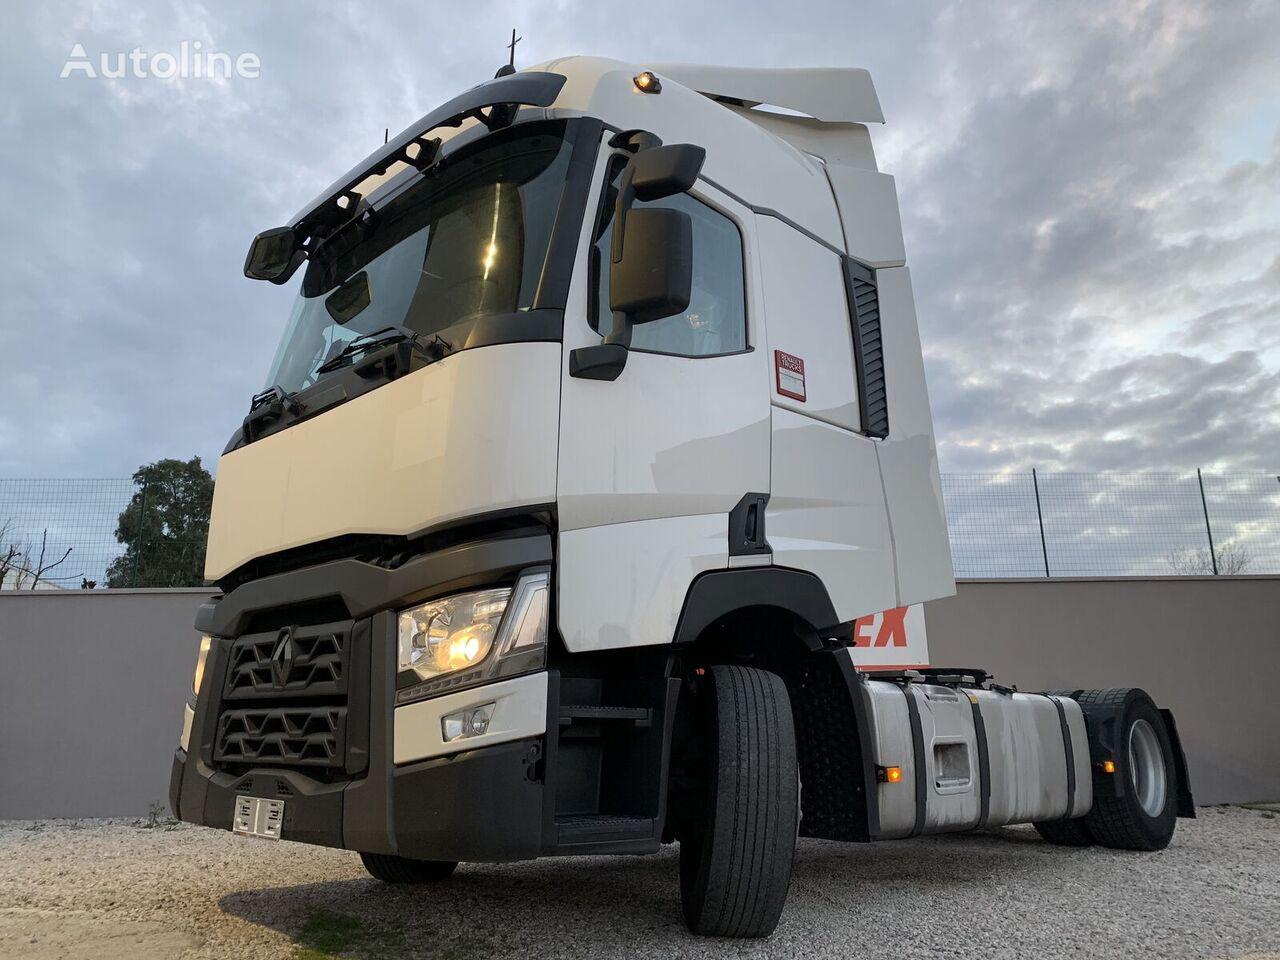 trattore stradale RENAULT 2017 -T 440 Comfort - Km 480.000 motore Volvo 12777 cc, 450 CV